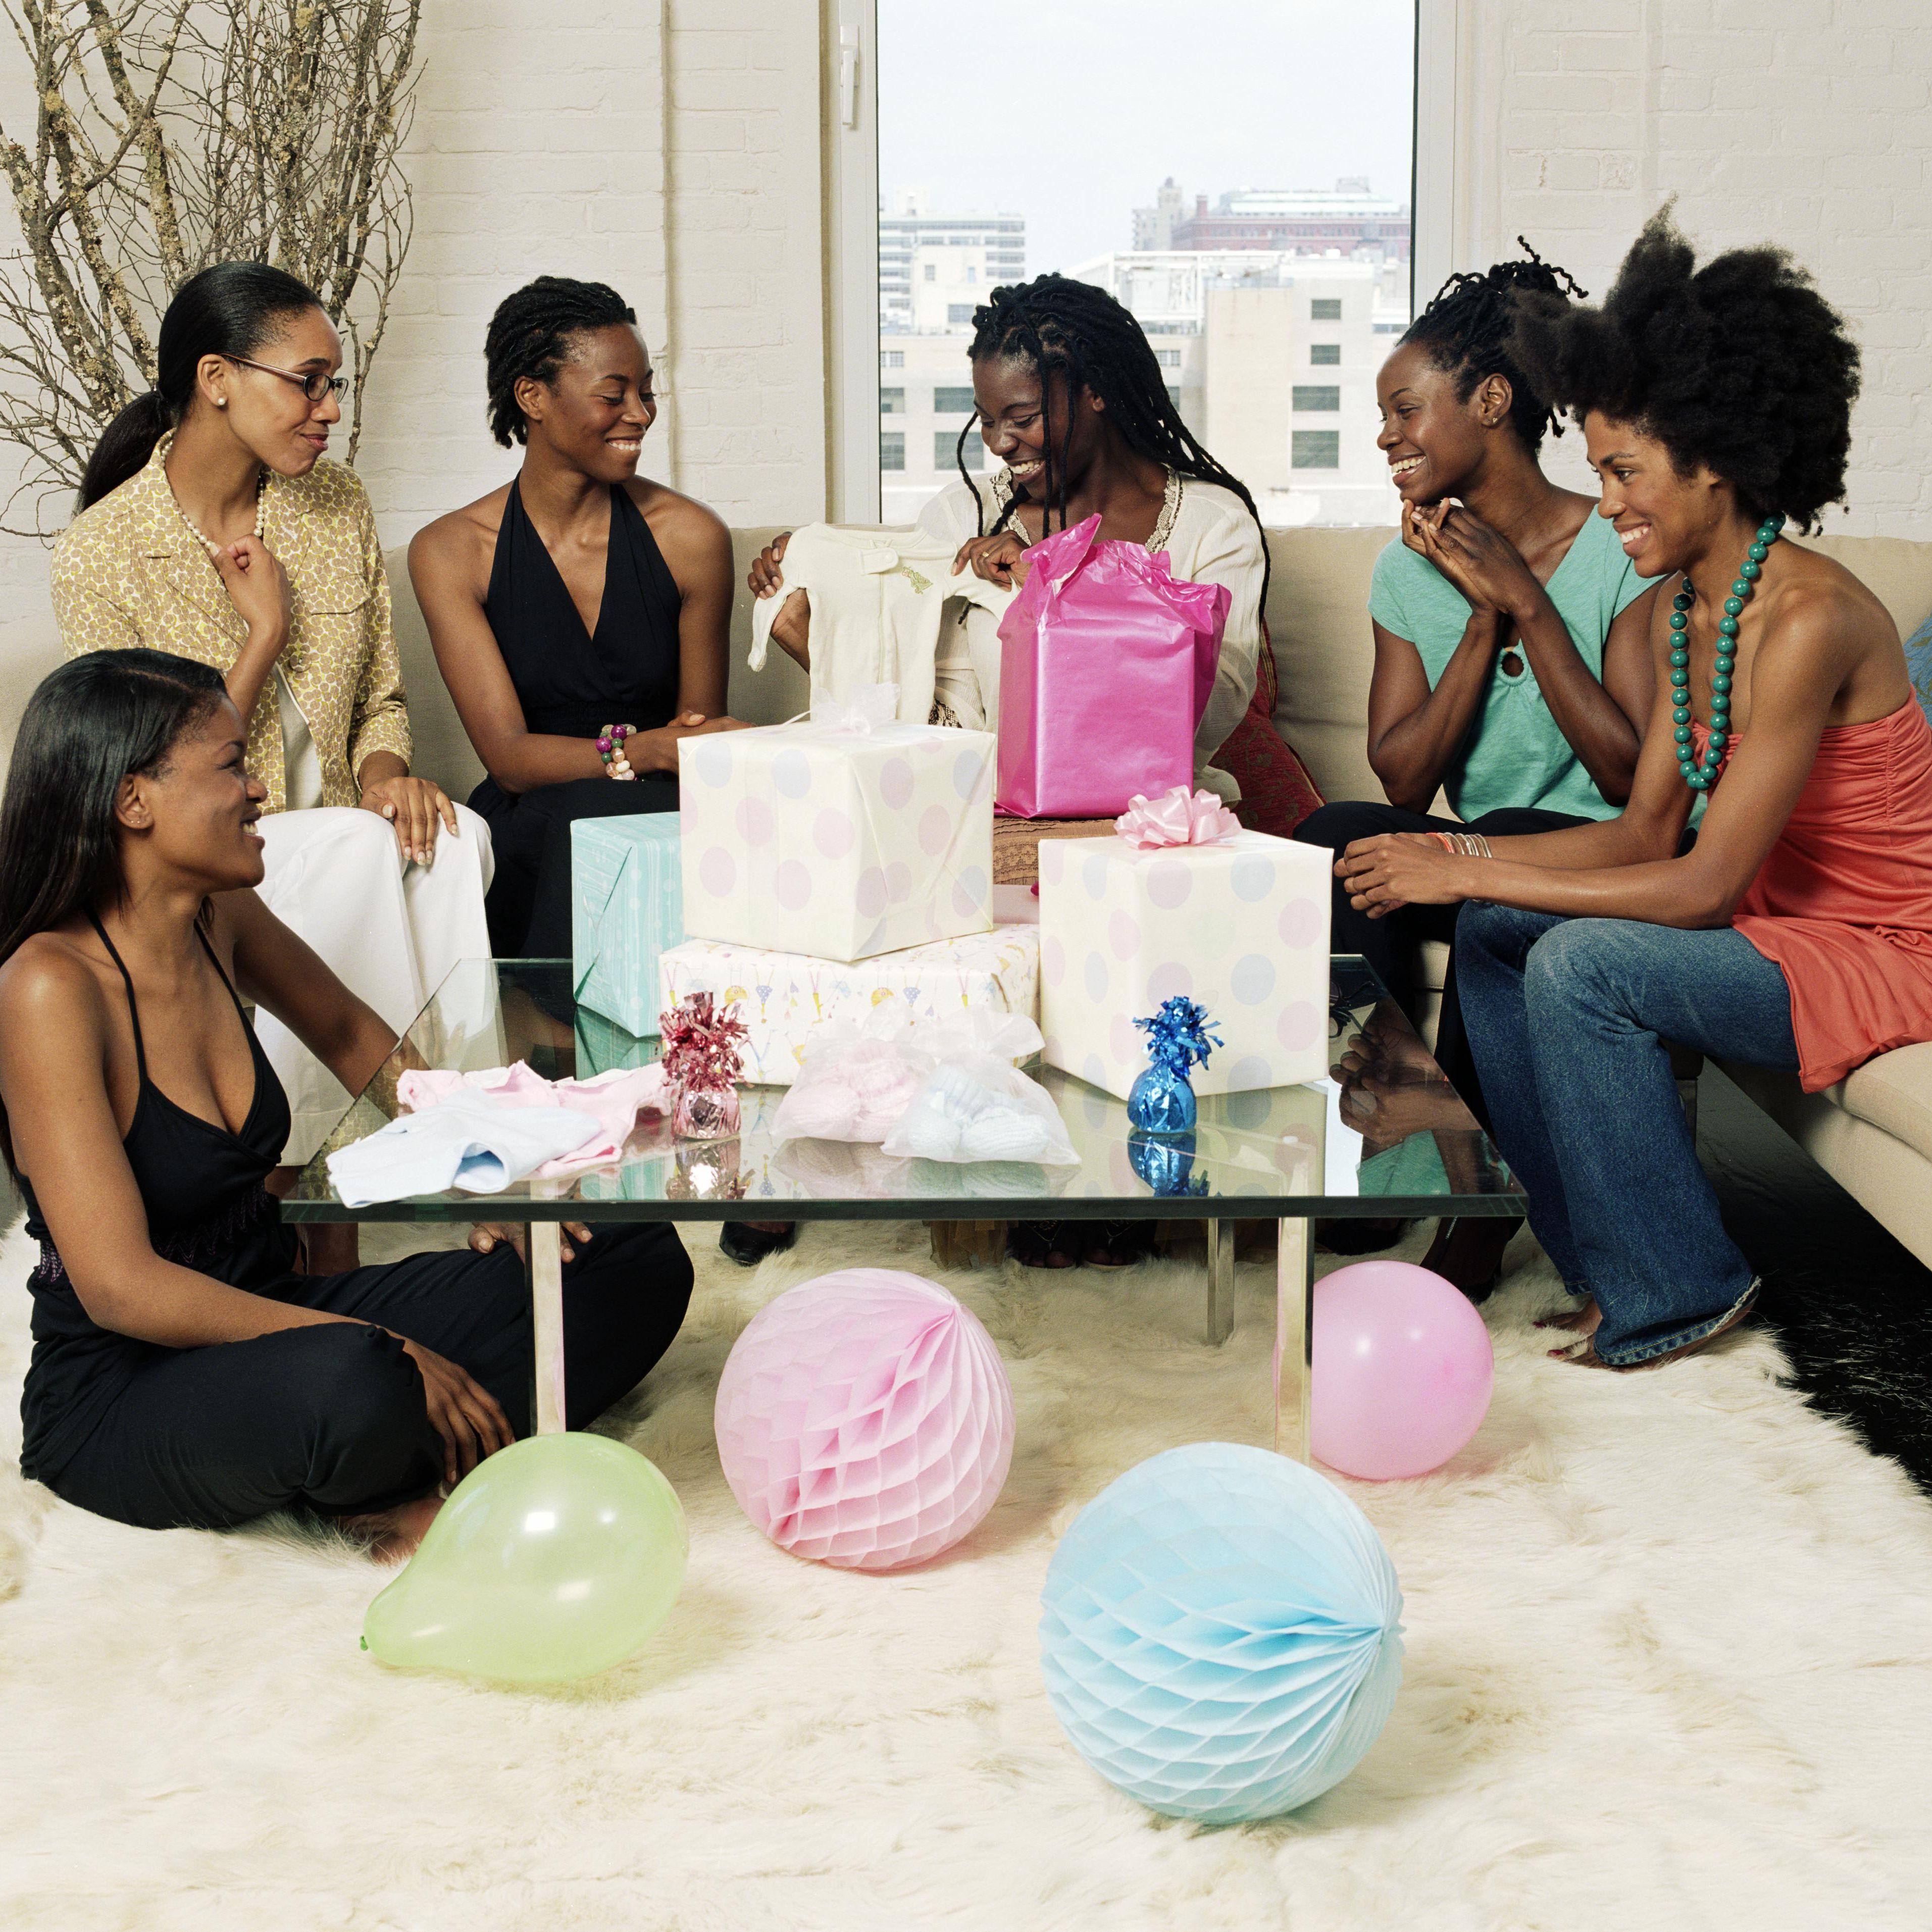 bridal shower decoration ideas homemade.htm how to plan a bridal shower tips and ideas  how to plan a bridal shower tips and